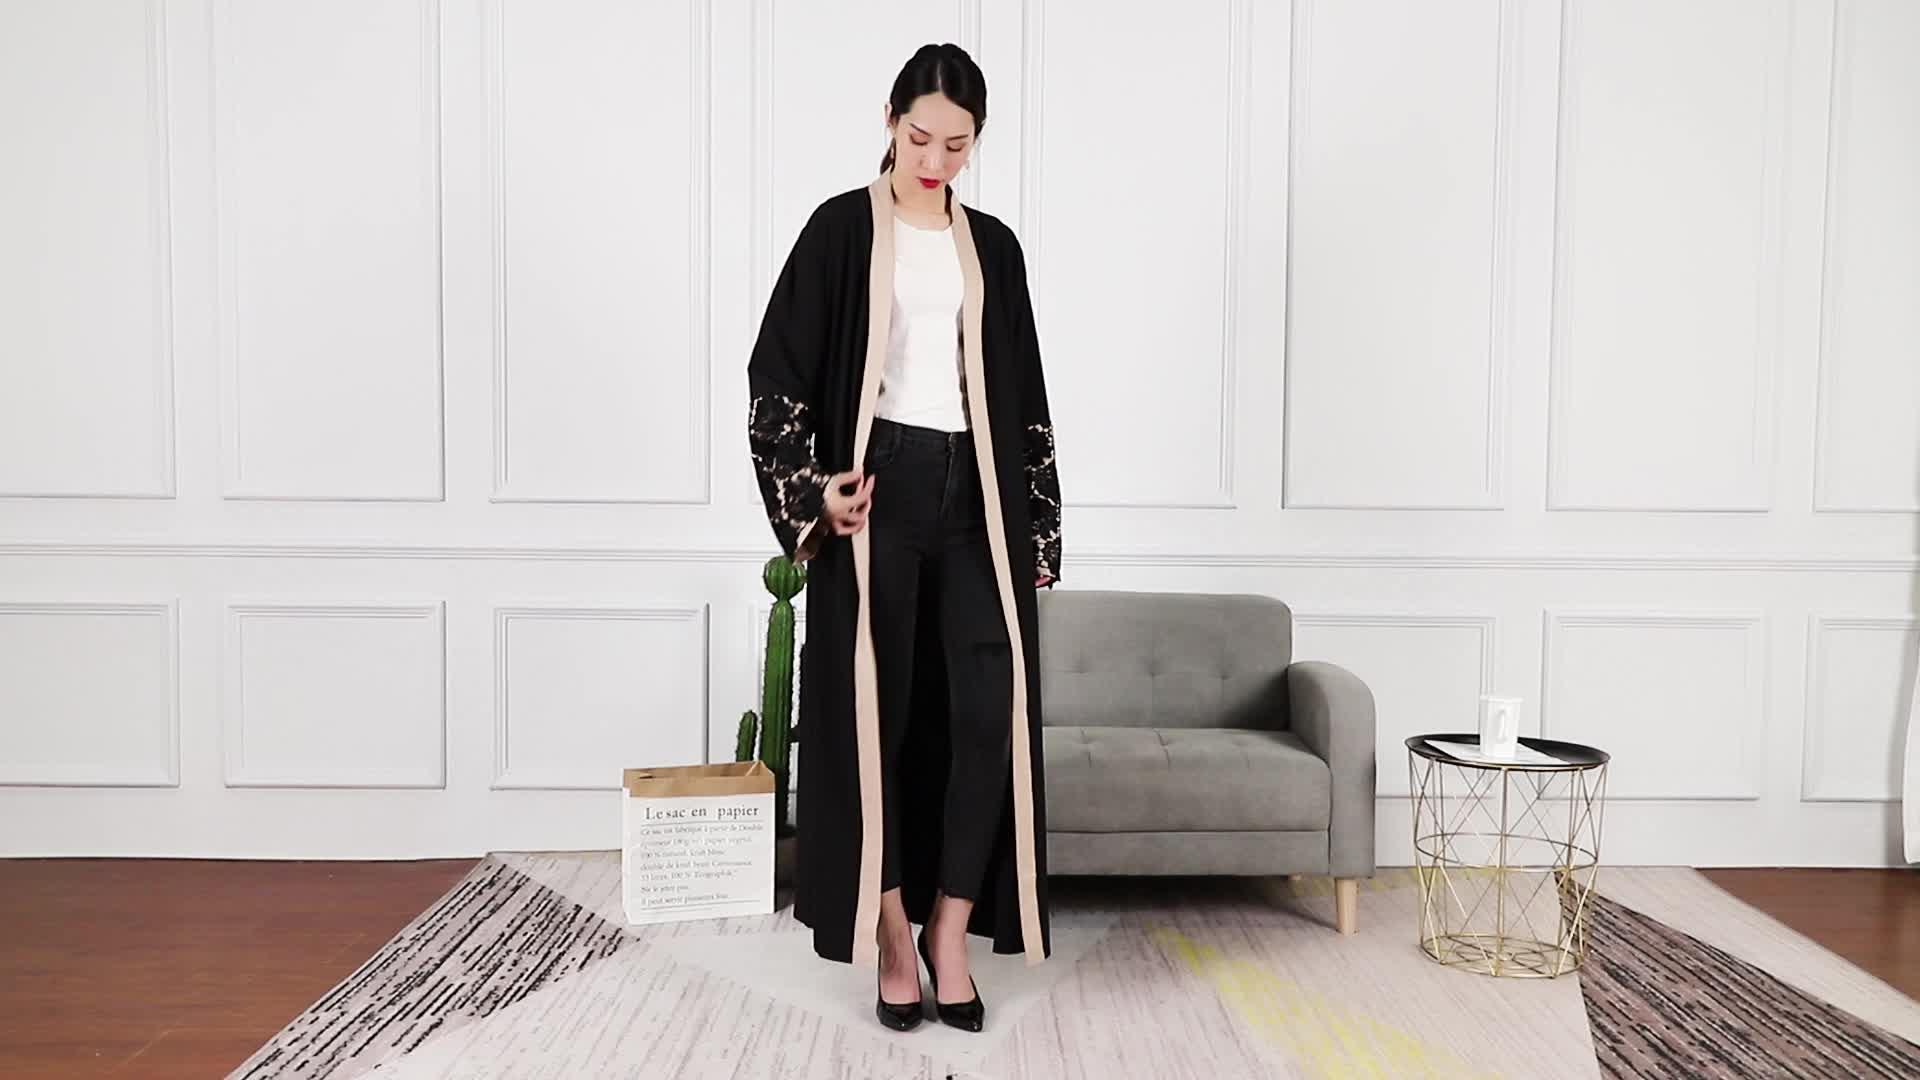 1502 # Nieuwste ontwerp abaya Boerka ontwerp Afrika kaftan turkse fashion vrouwen kleding spanje